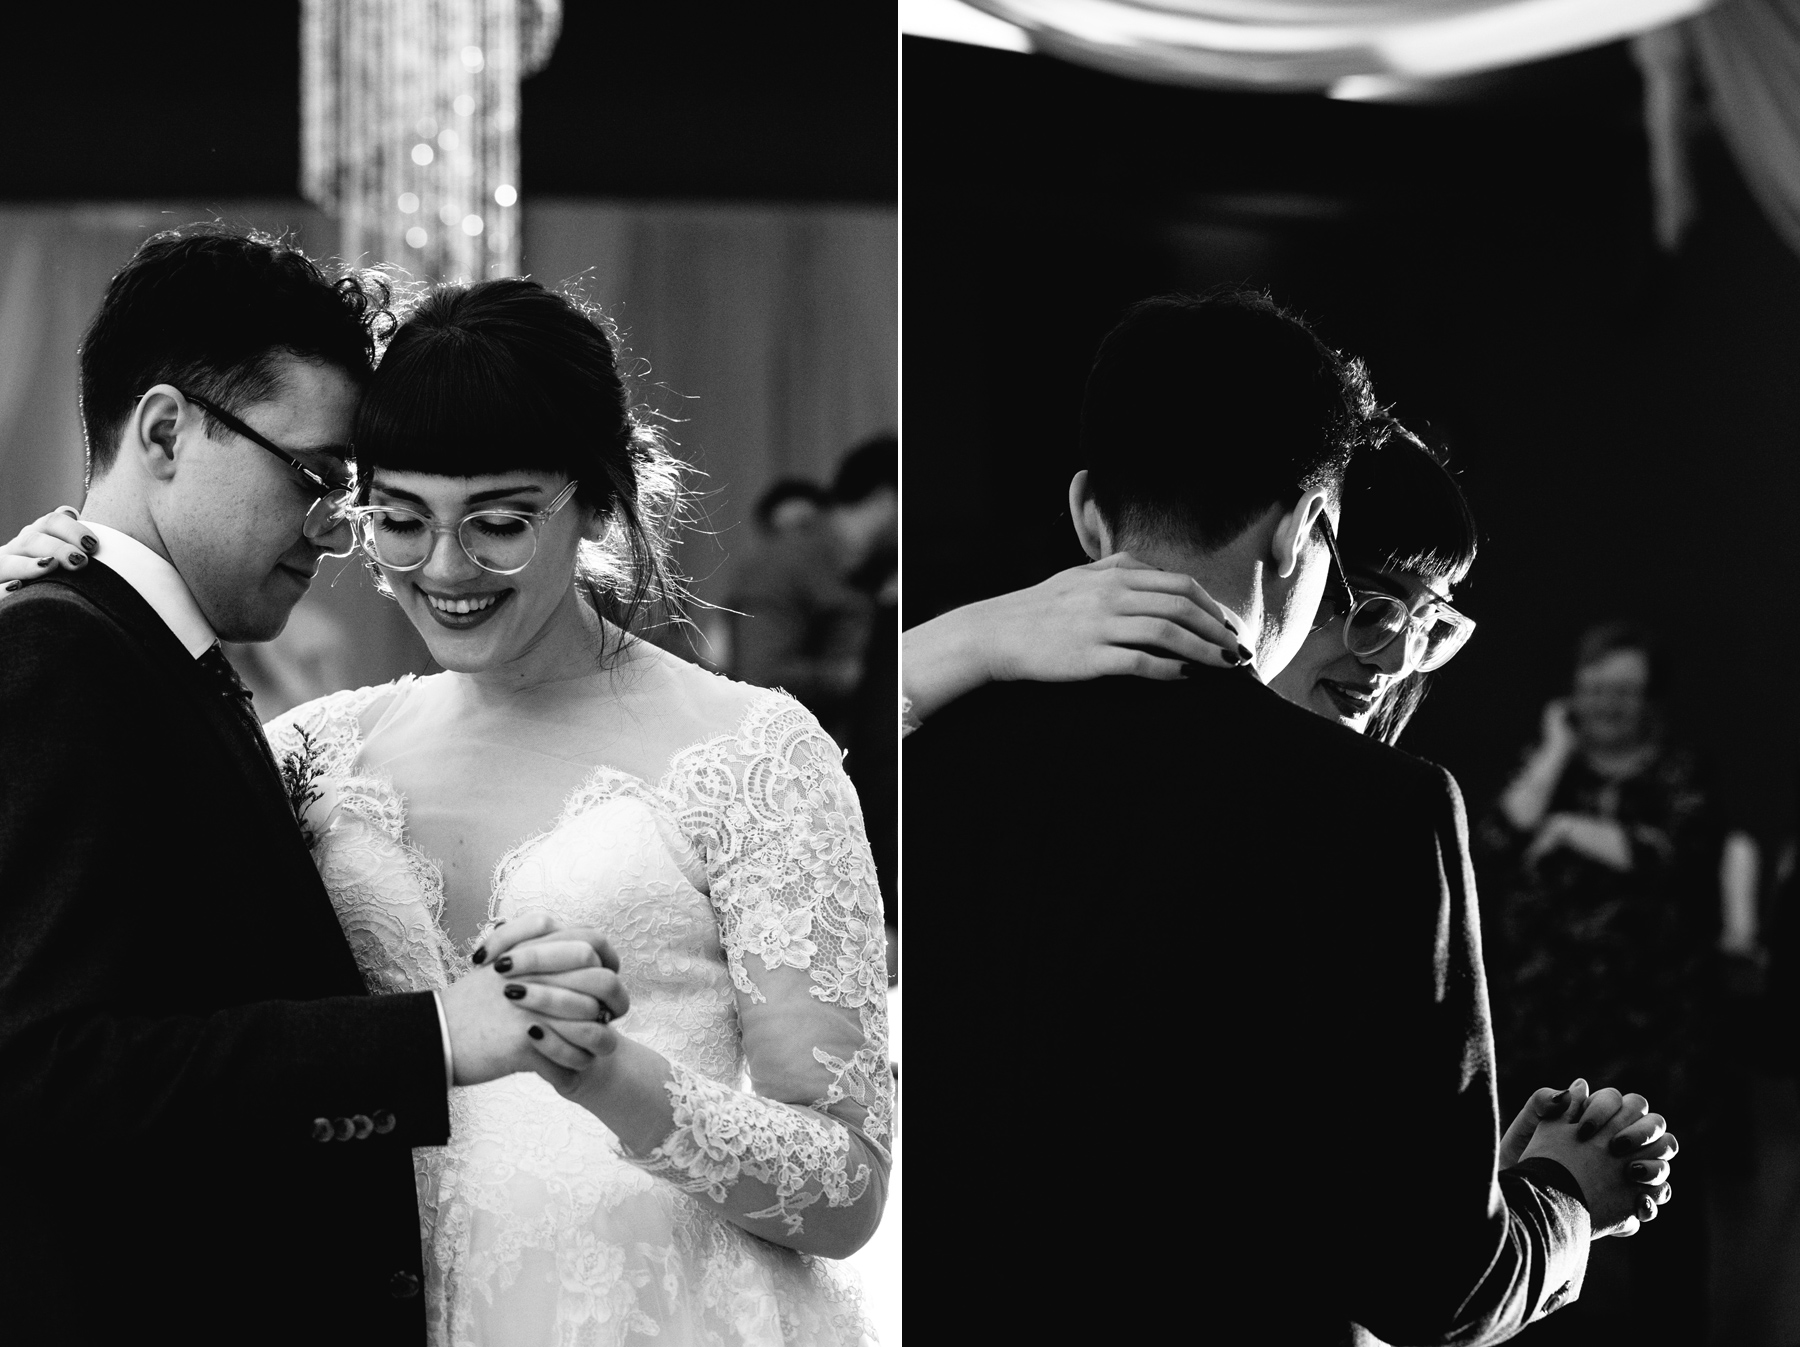 073-fredericton-wedding-photographer-kandisebrown-em2017